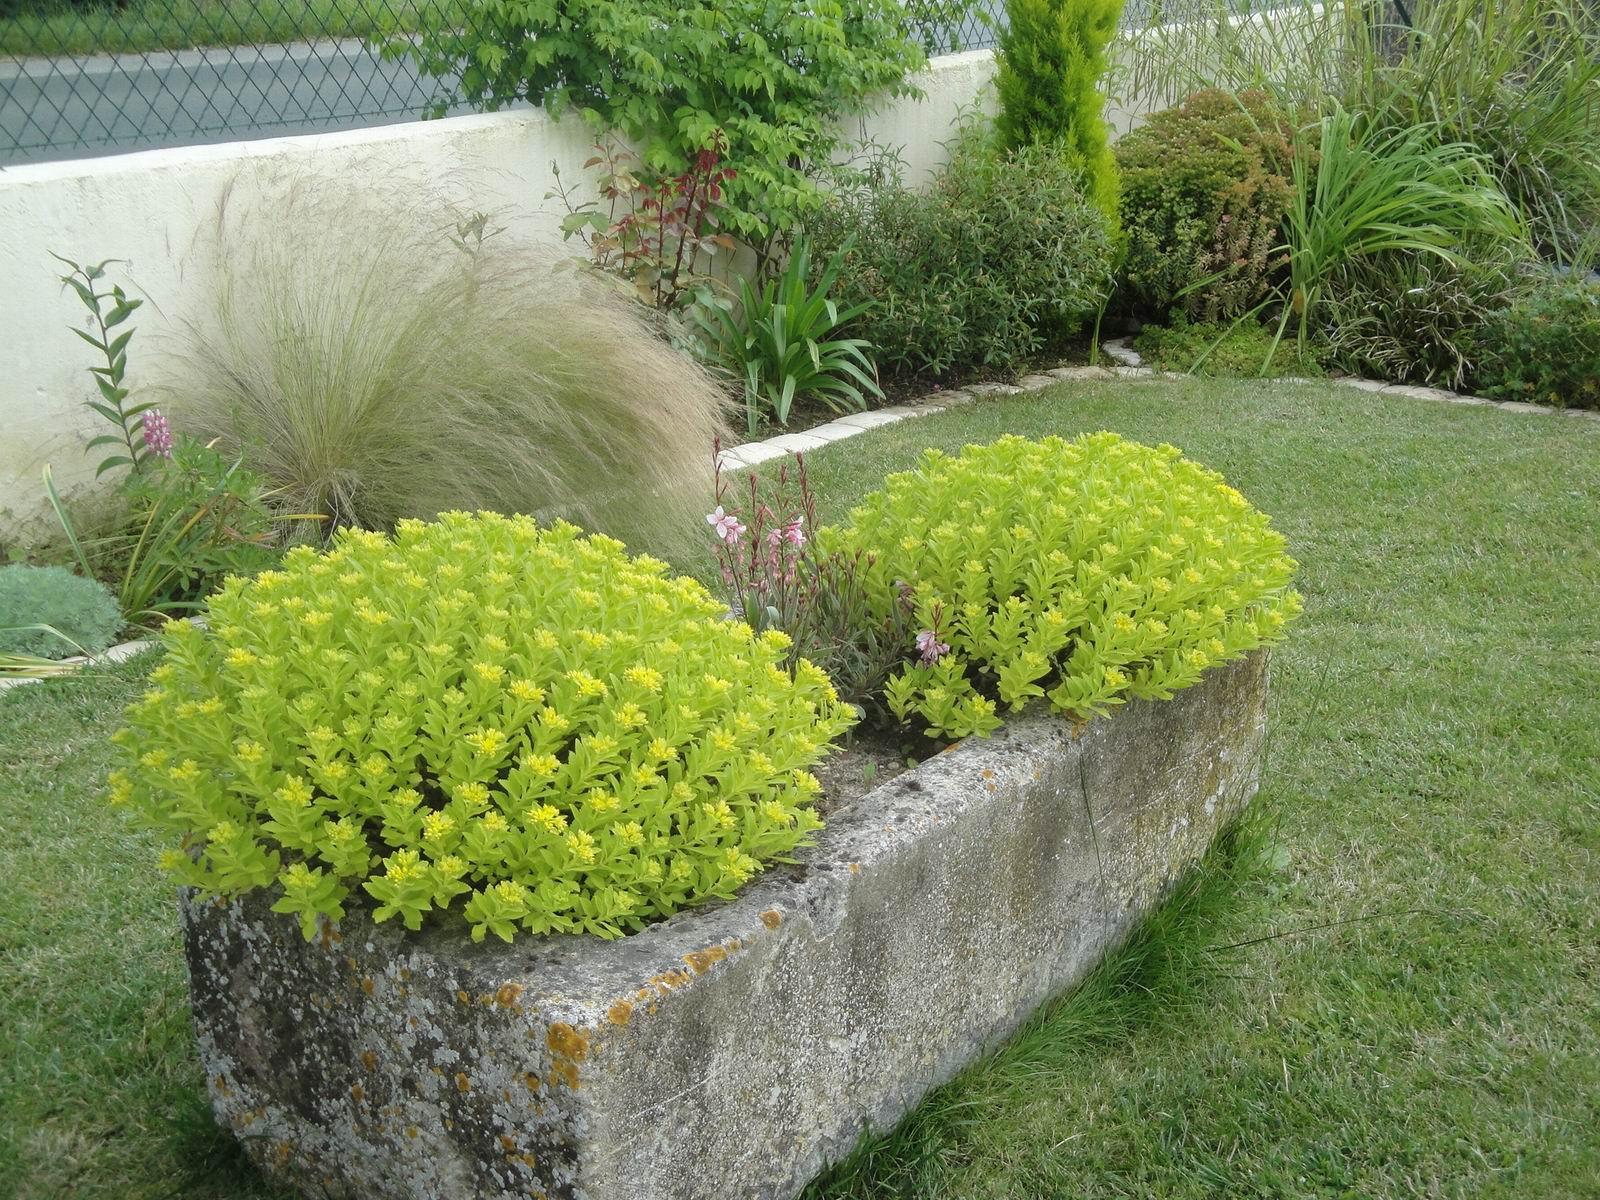 Cocoon Garden: Commande Promesse de Fleurs...